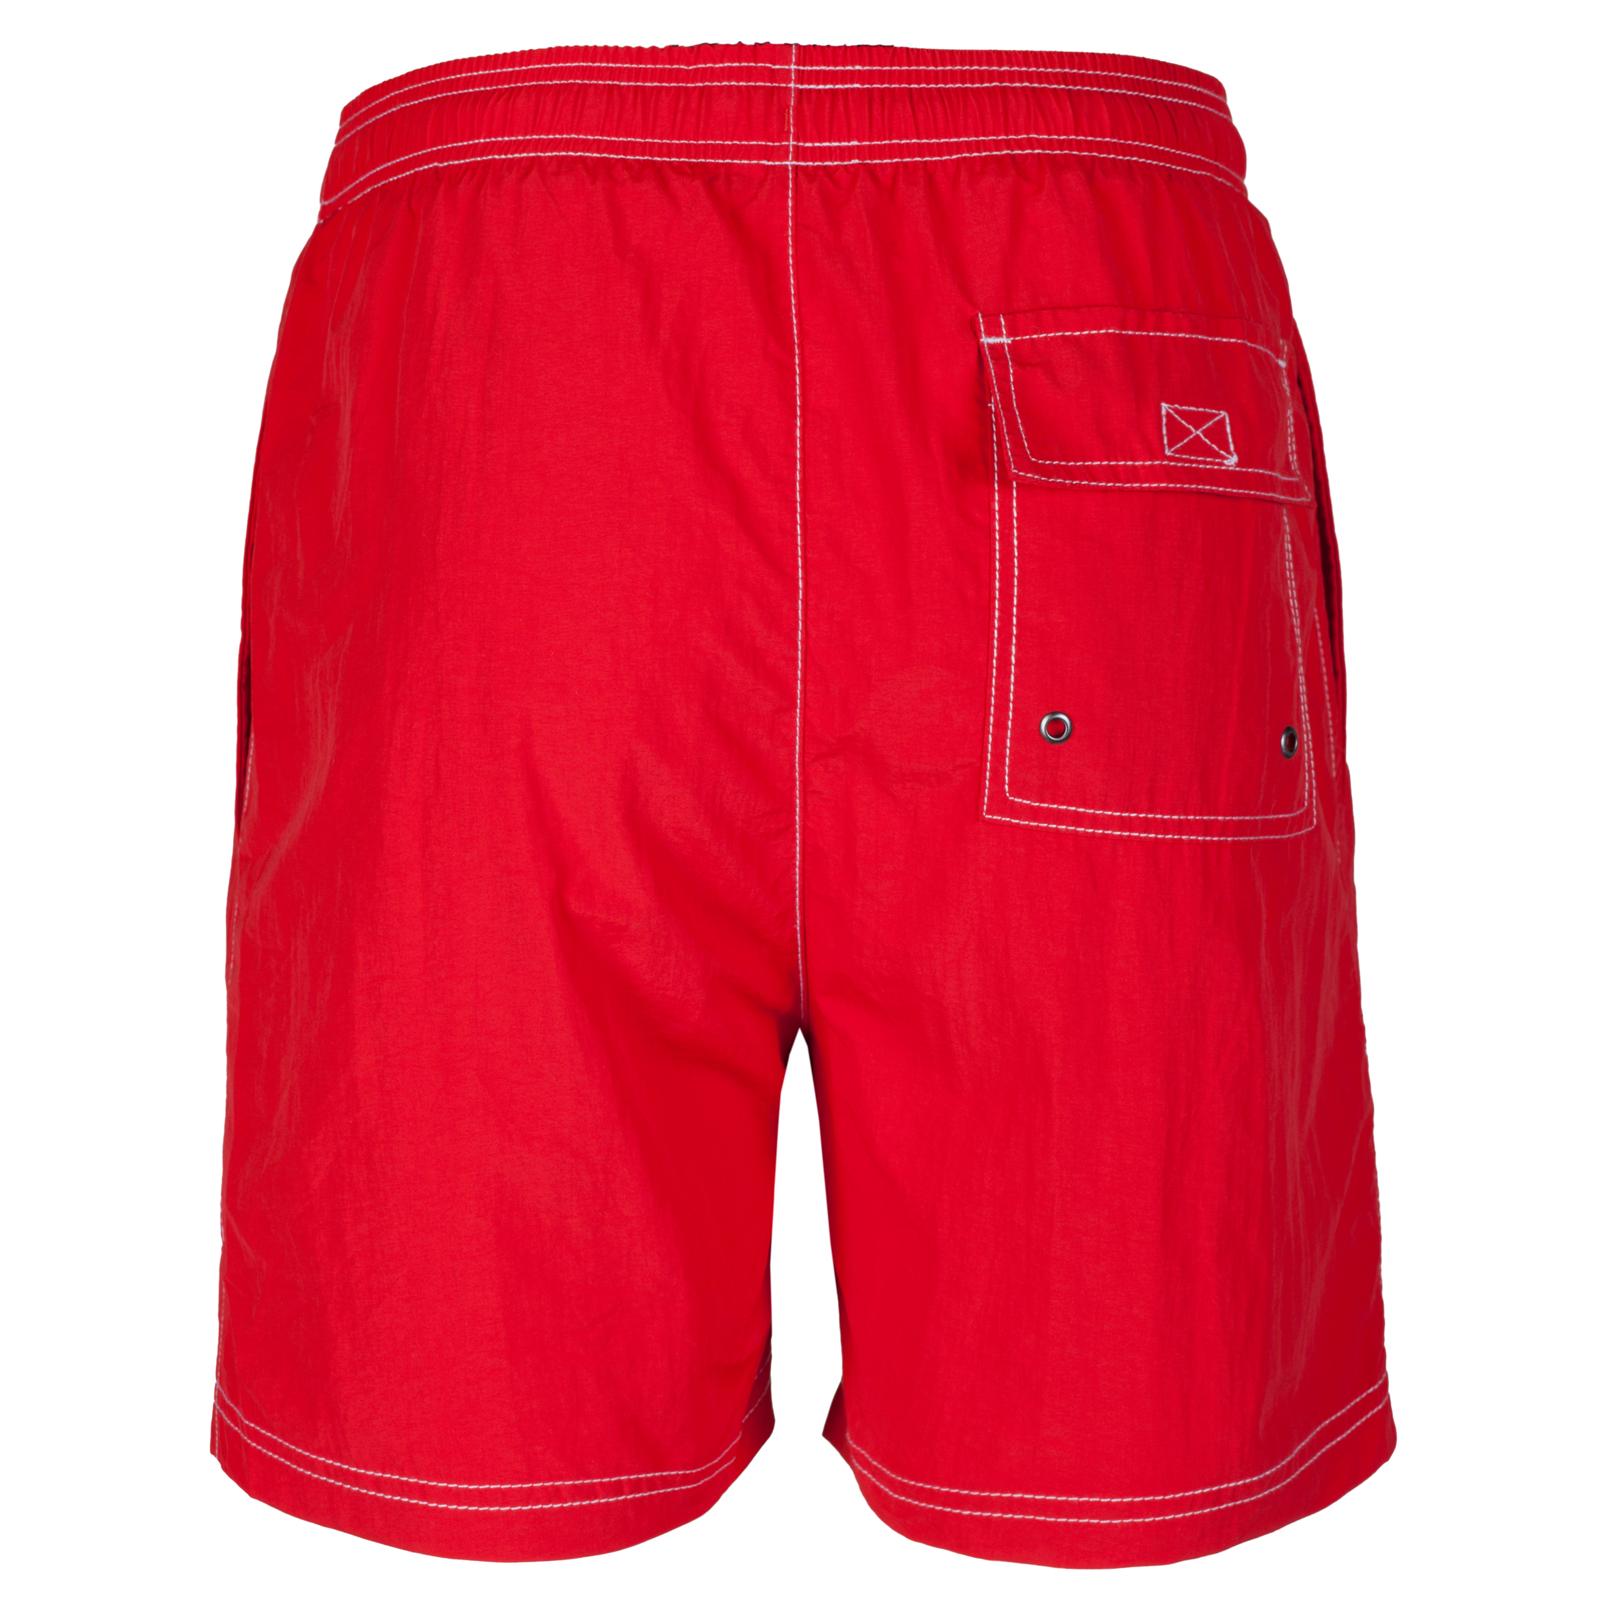 Henleys Mens Logo Swim Shorts Swimming Trunks Board Shorts ...